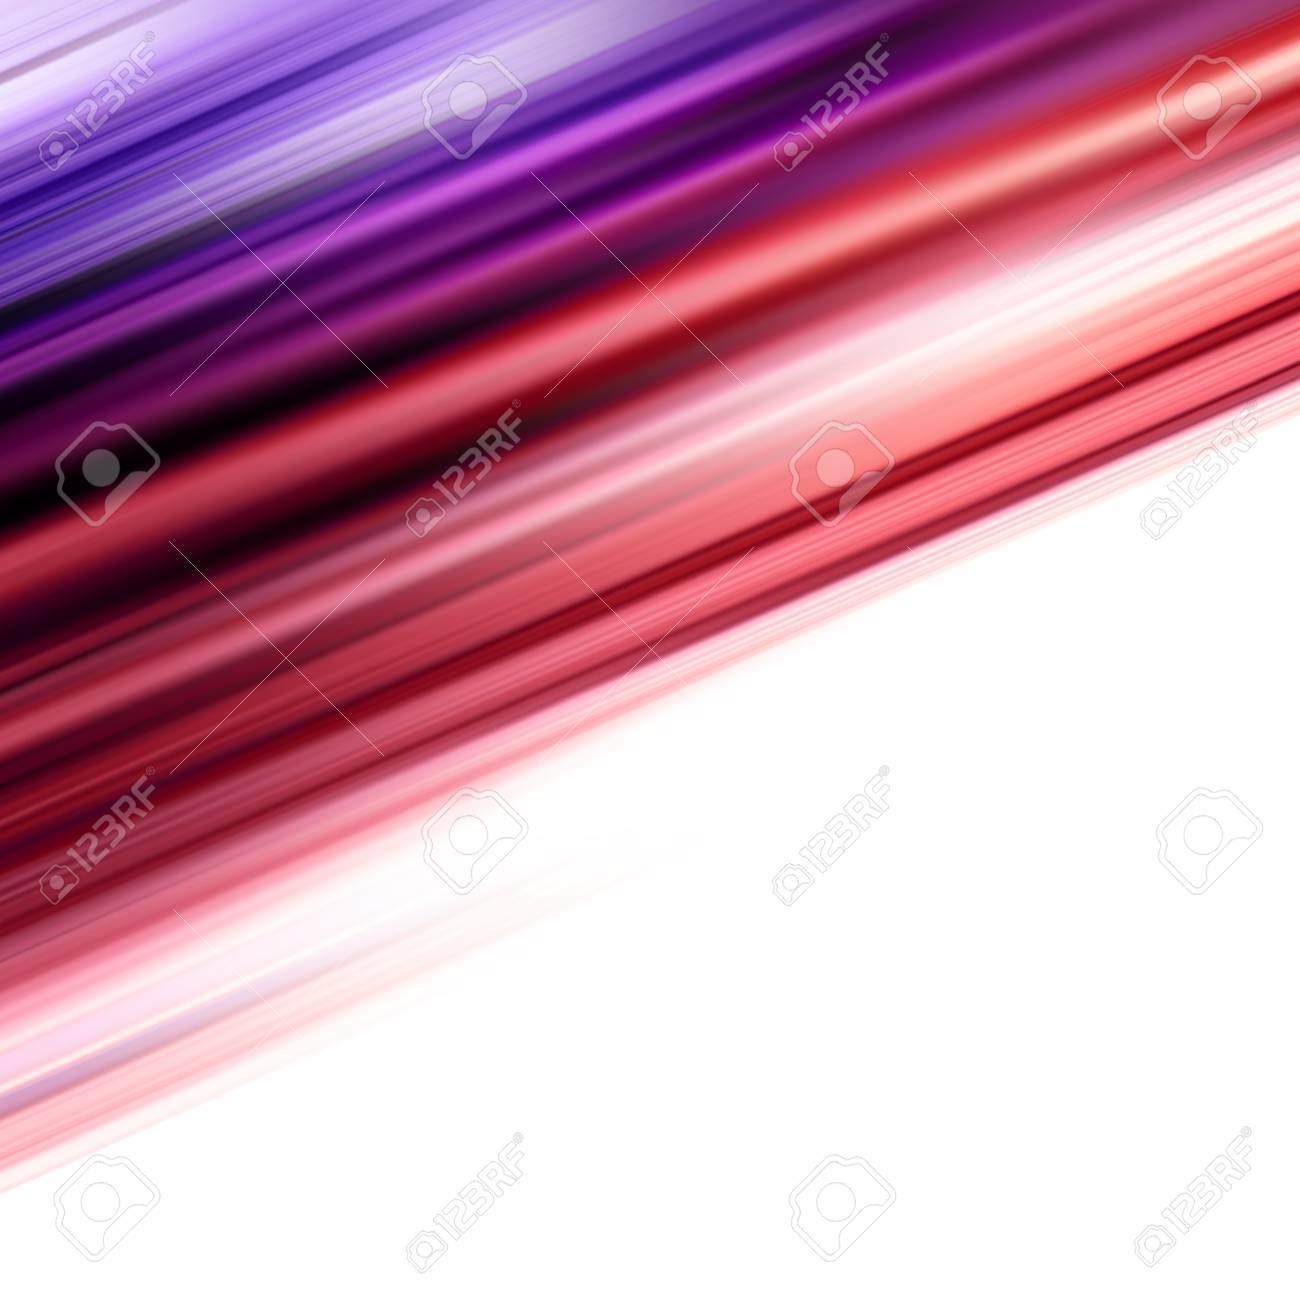 Abstract wonderful stripe background Stock Photo - 9203495